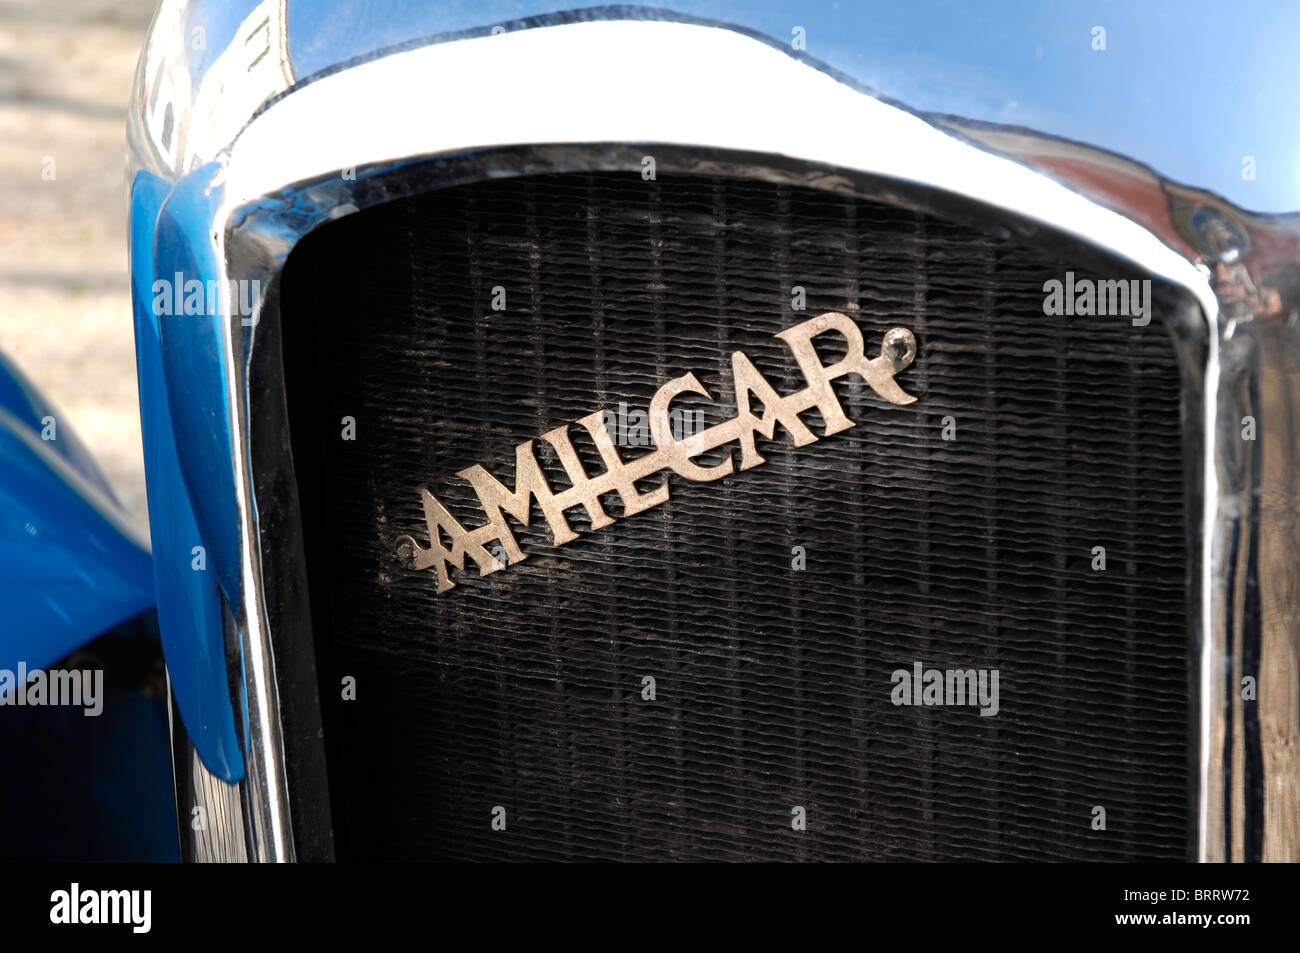 Amilcar CG SS 1928 - Stock Image